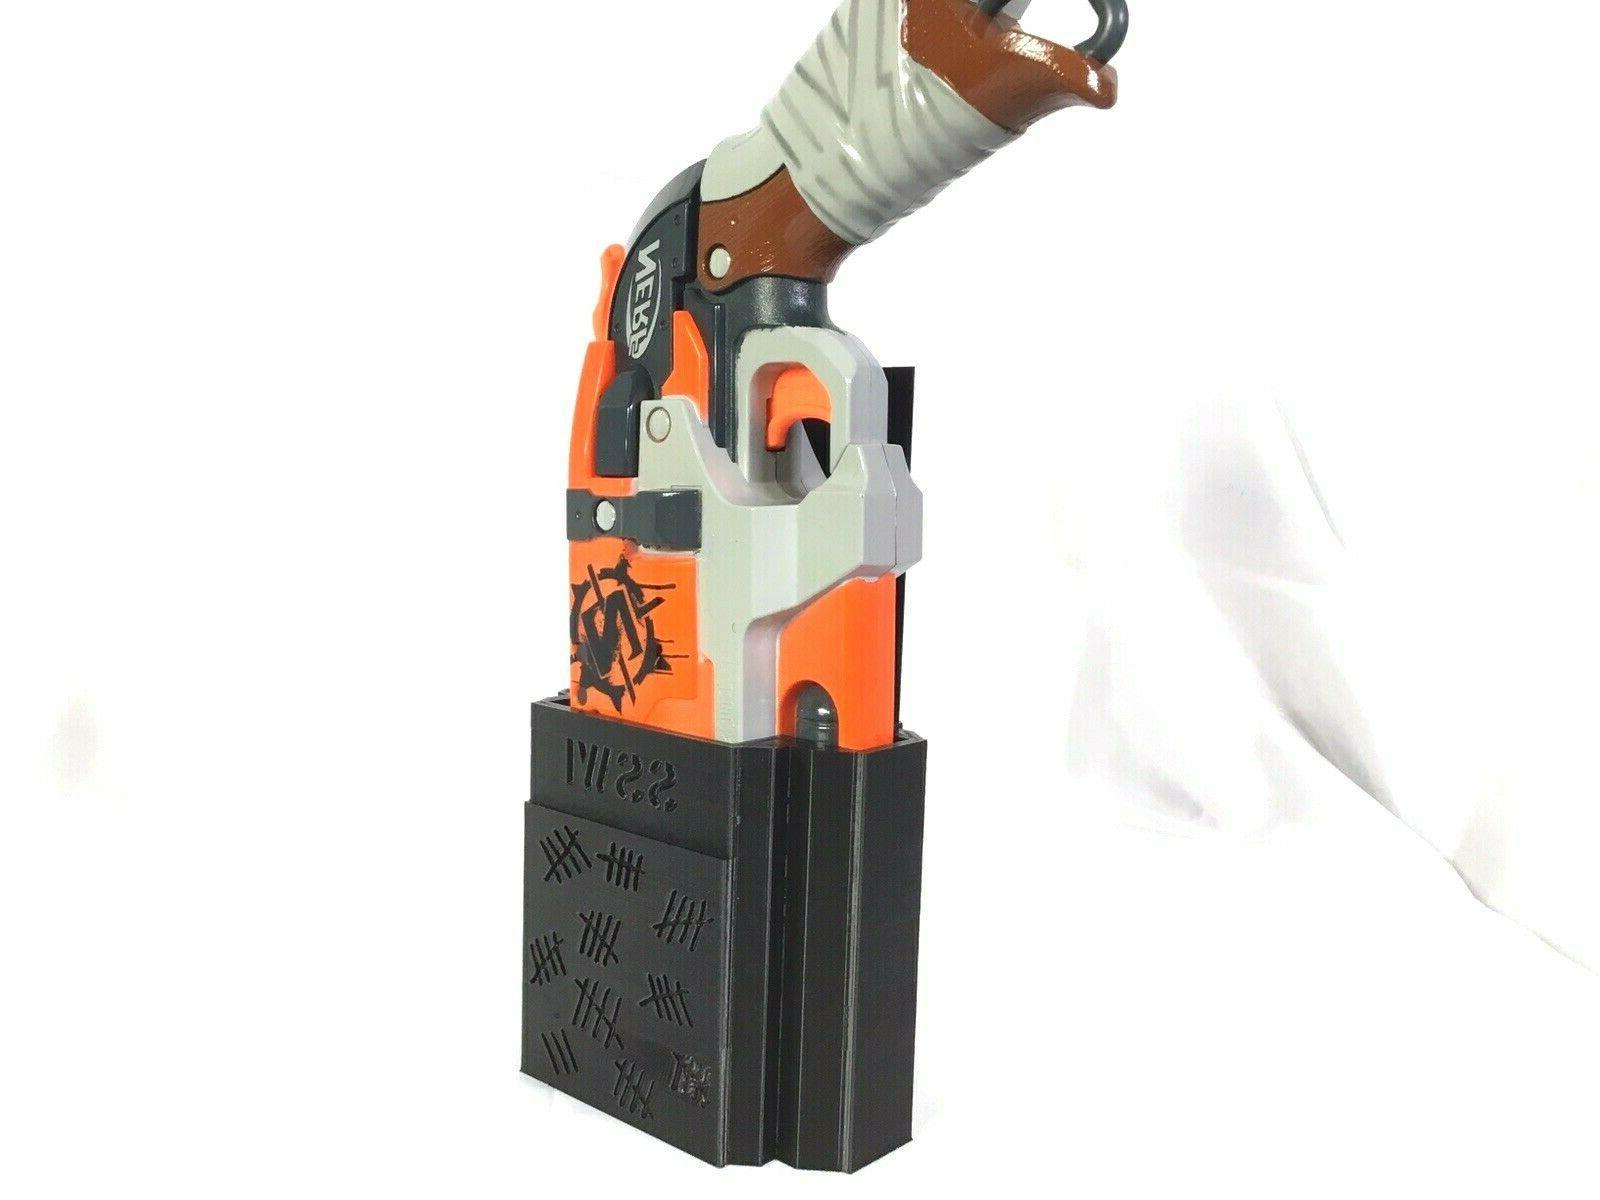 SSWI Custom or Leg Mod HammerShot - Hammer Shot